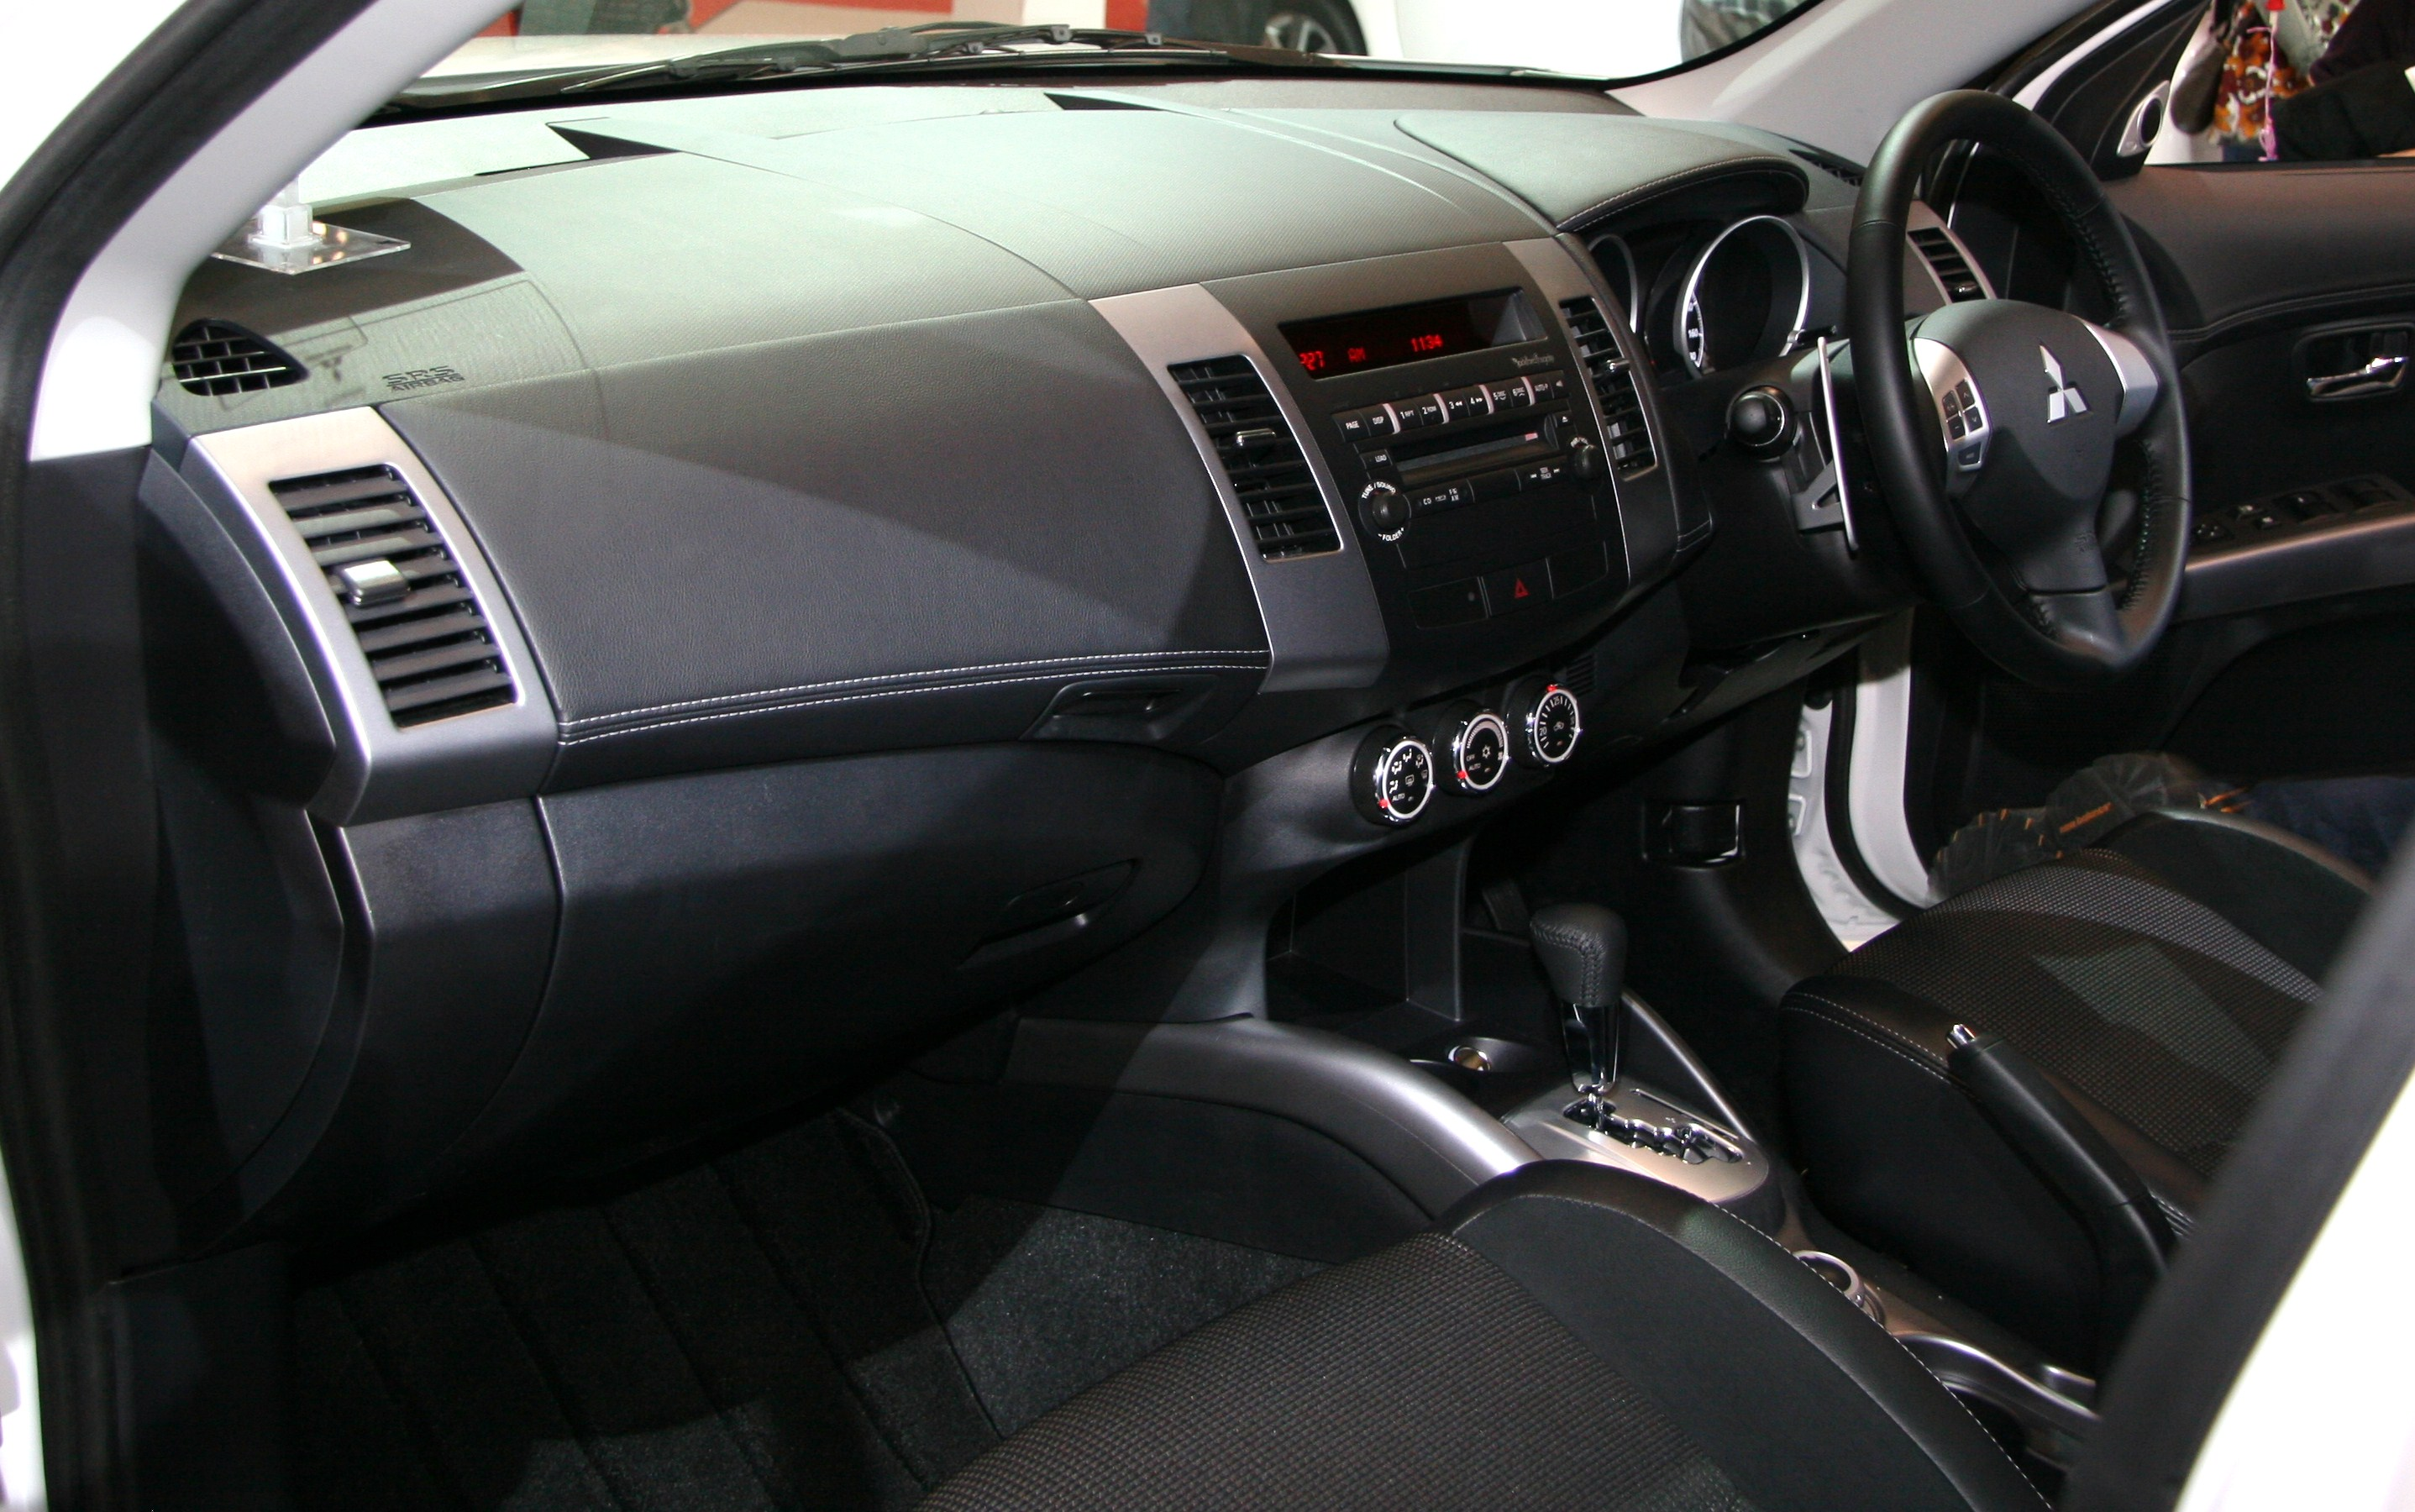 File:Mitsubishi Outlander Roadest interior.jpg - Wikimedia Commons